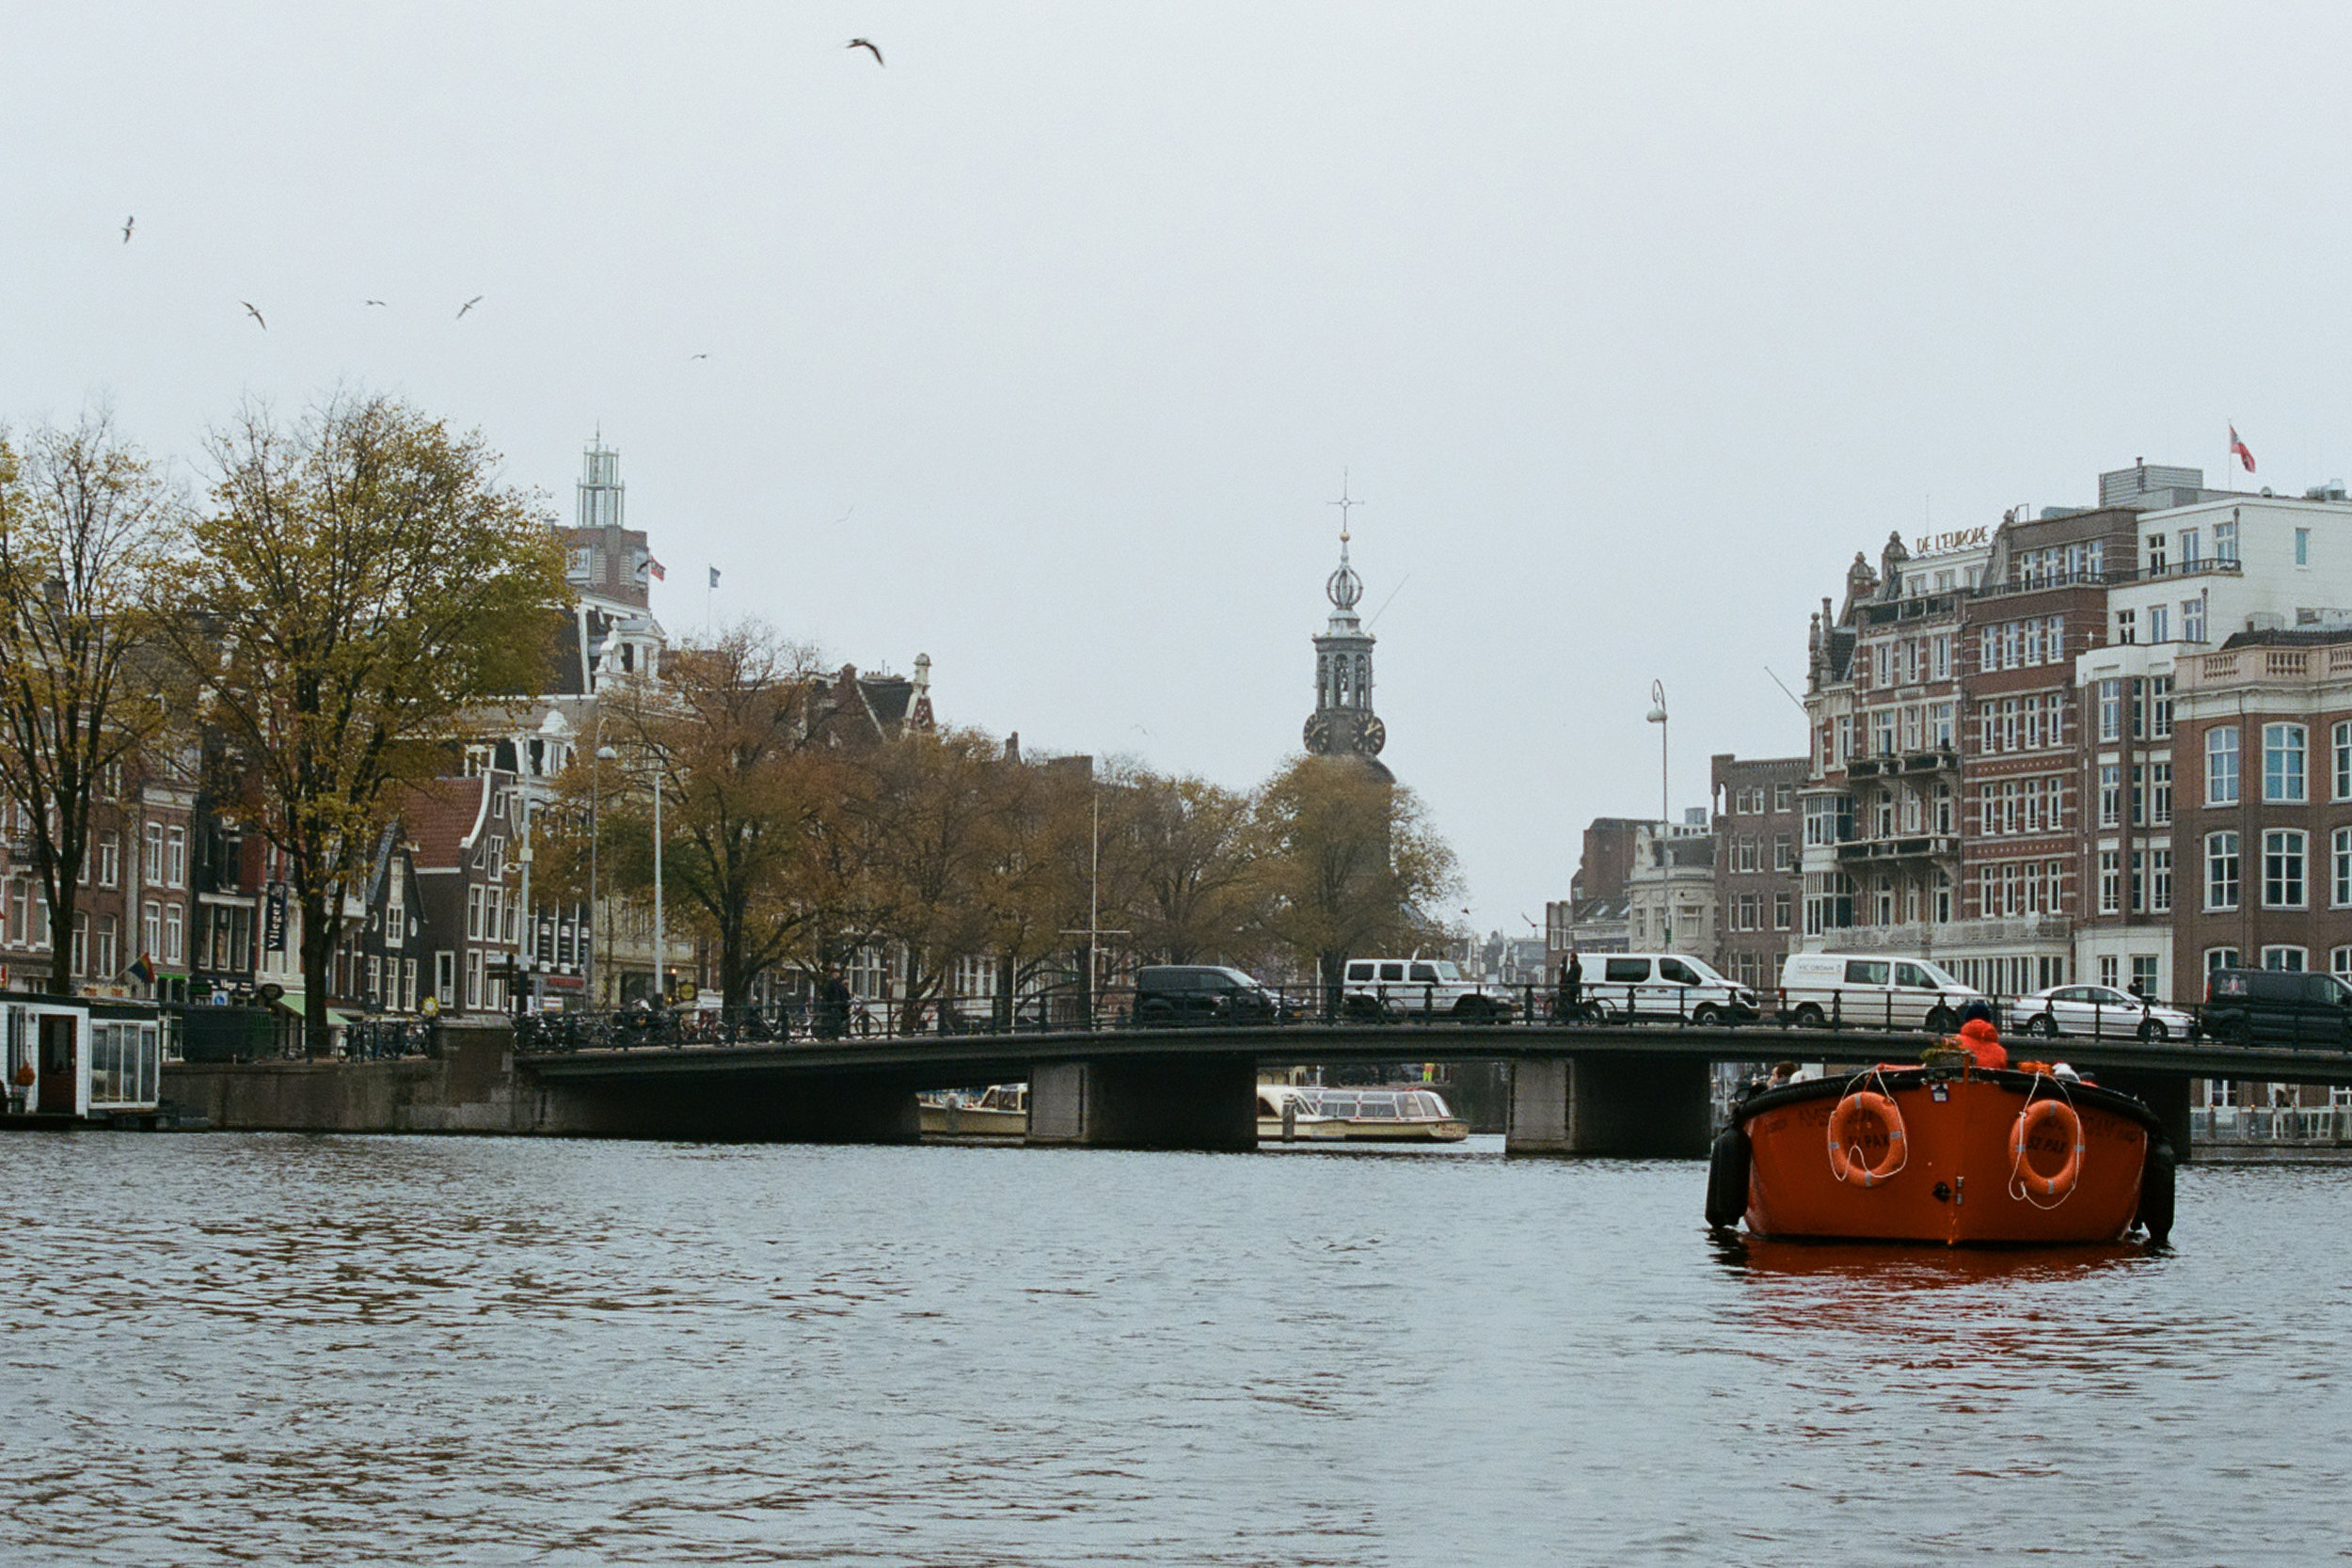 Amsterdam_0102 copy.jpg